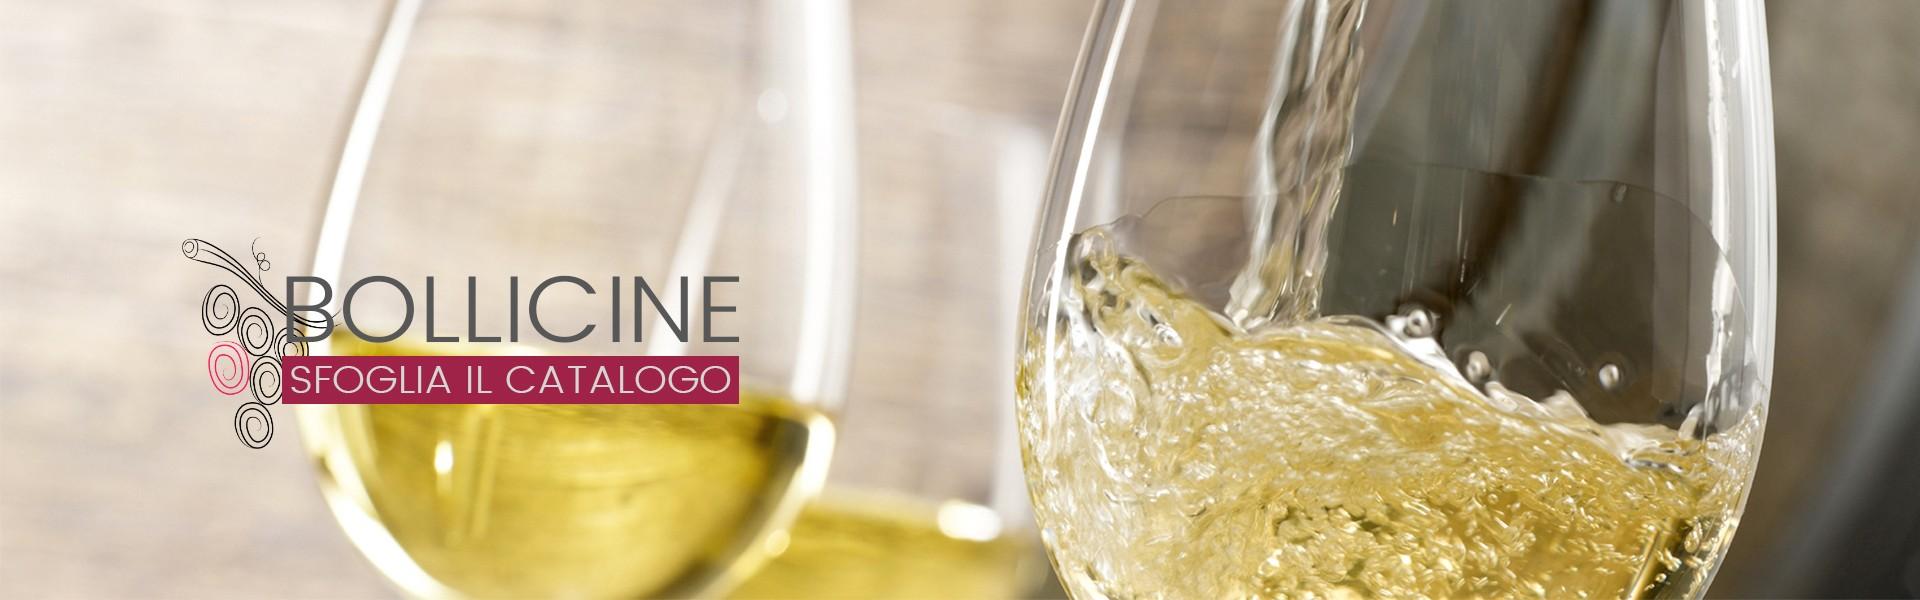 Vini Bollicine